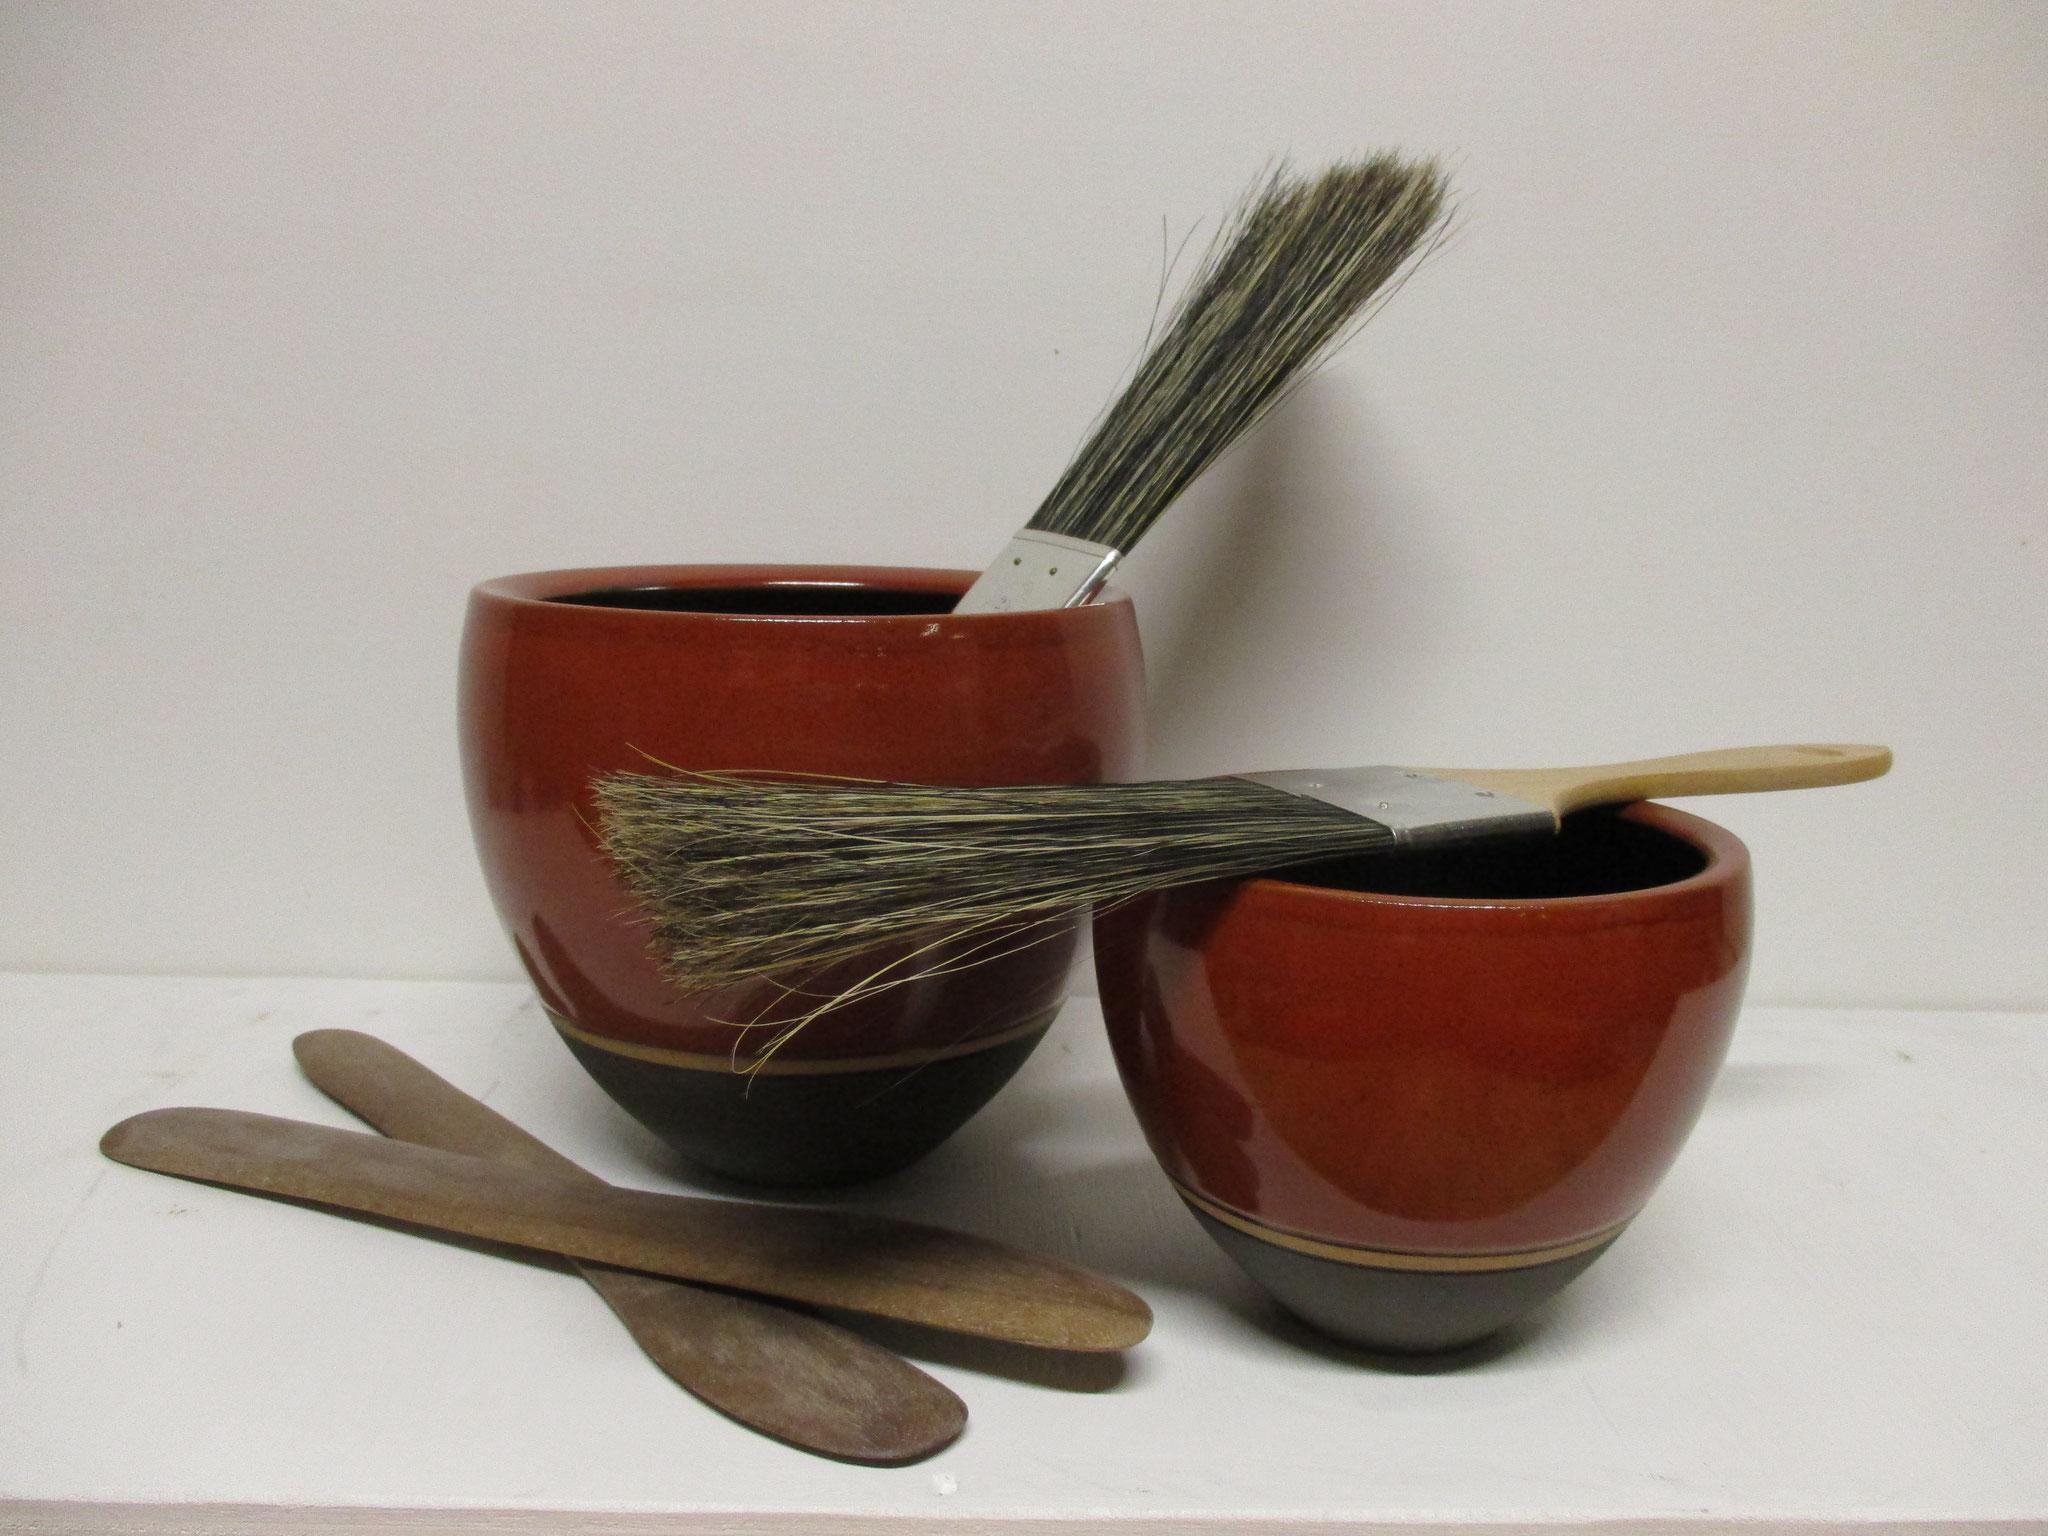 Preuß & Ploenes     Keramik in der Salzkothe